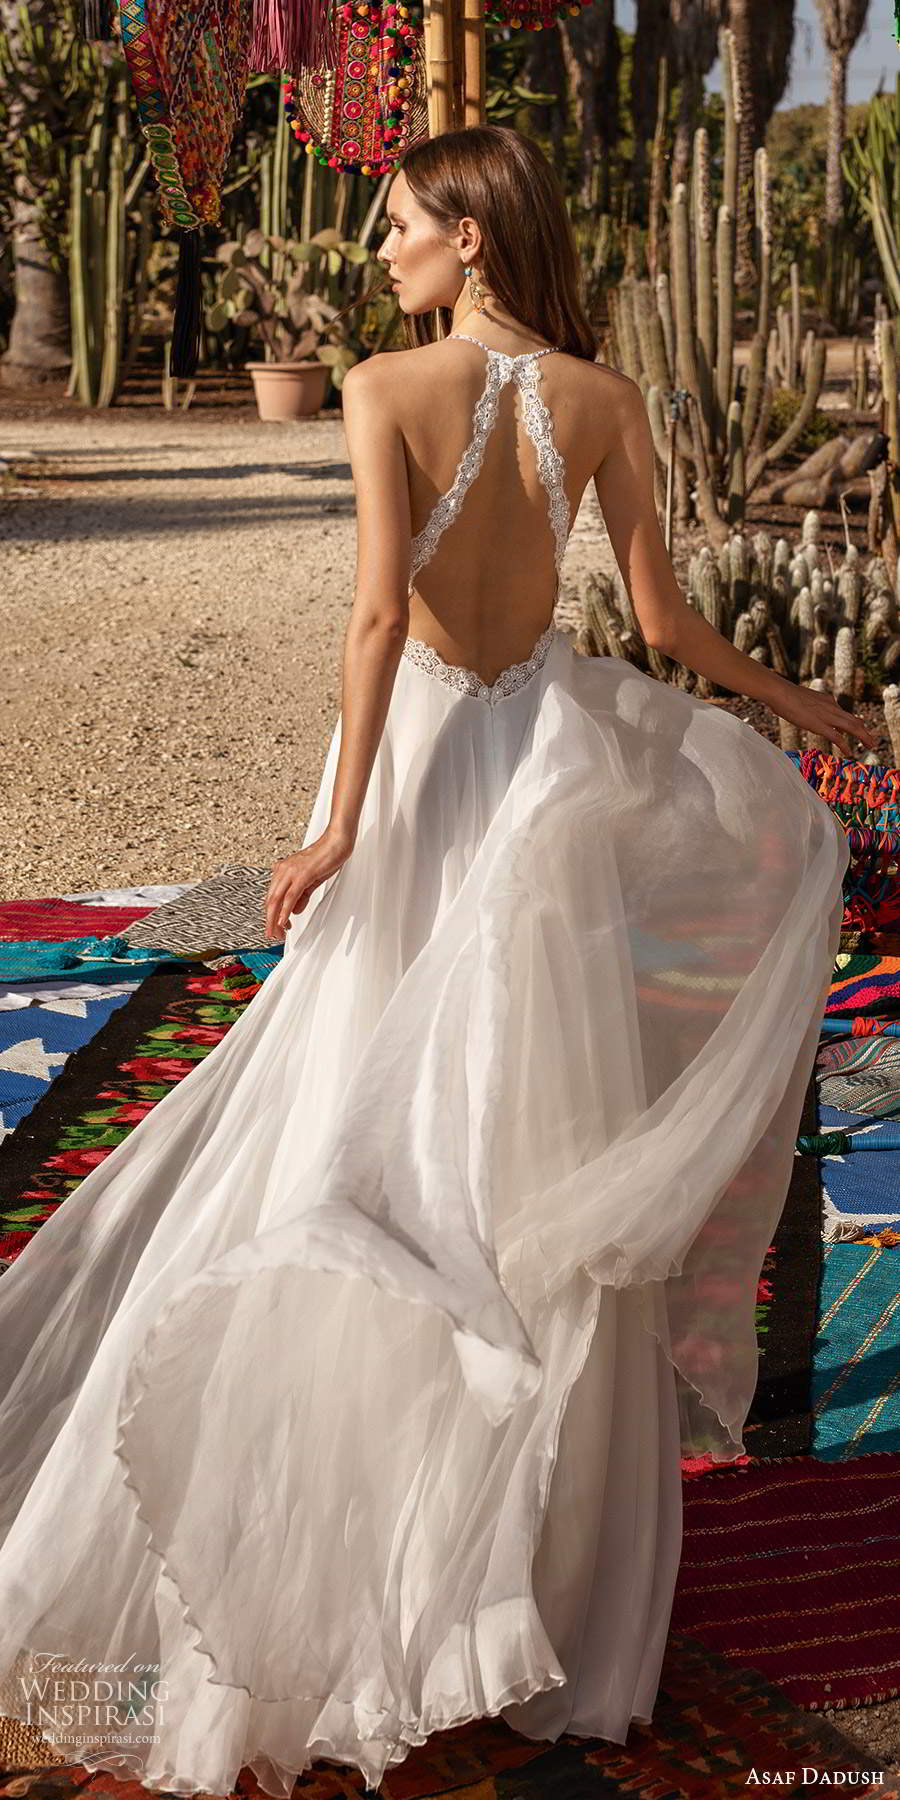 asaf dadush 2020 bridal sleeveless halter neck straps sweetheart neckline embellished bodice a line wedding dress (7) bv